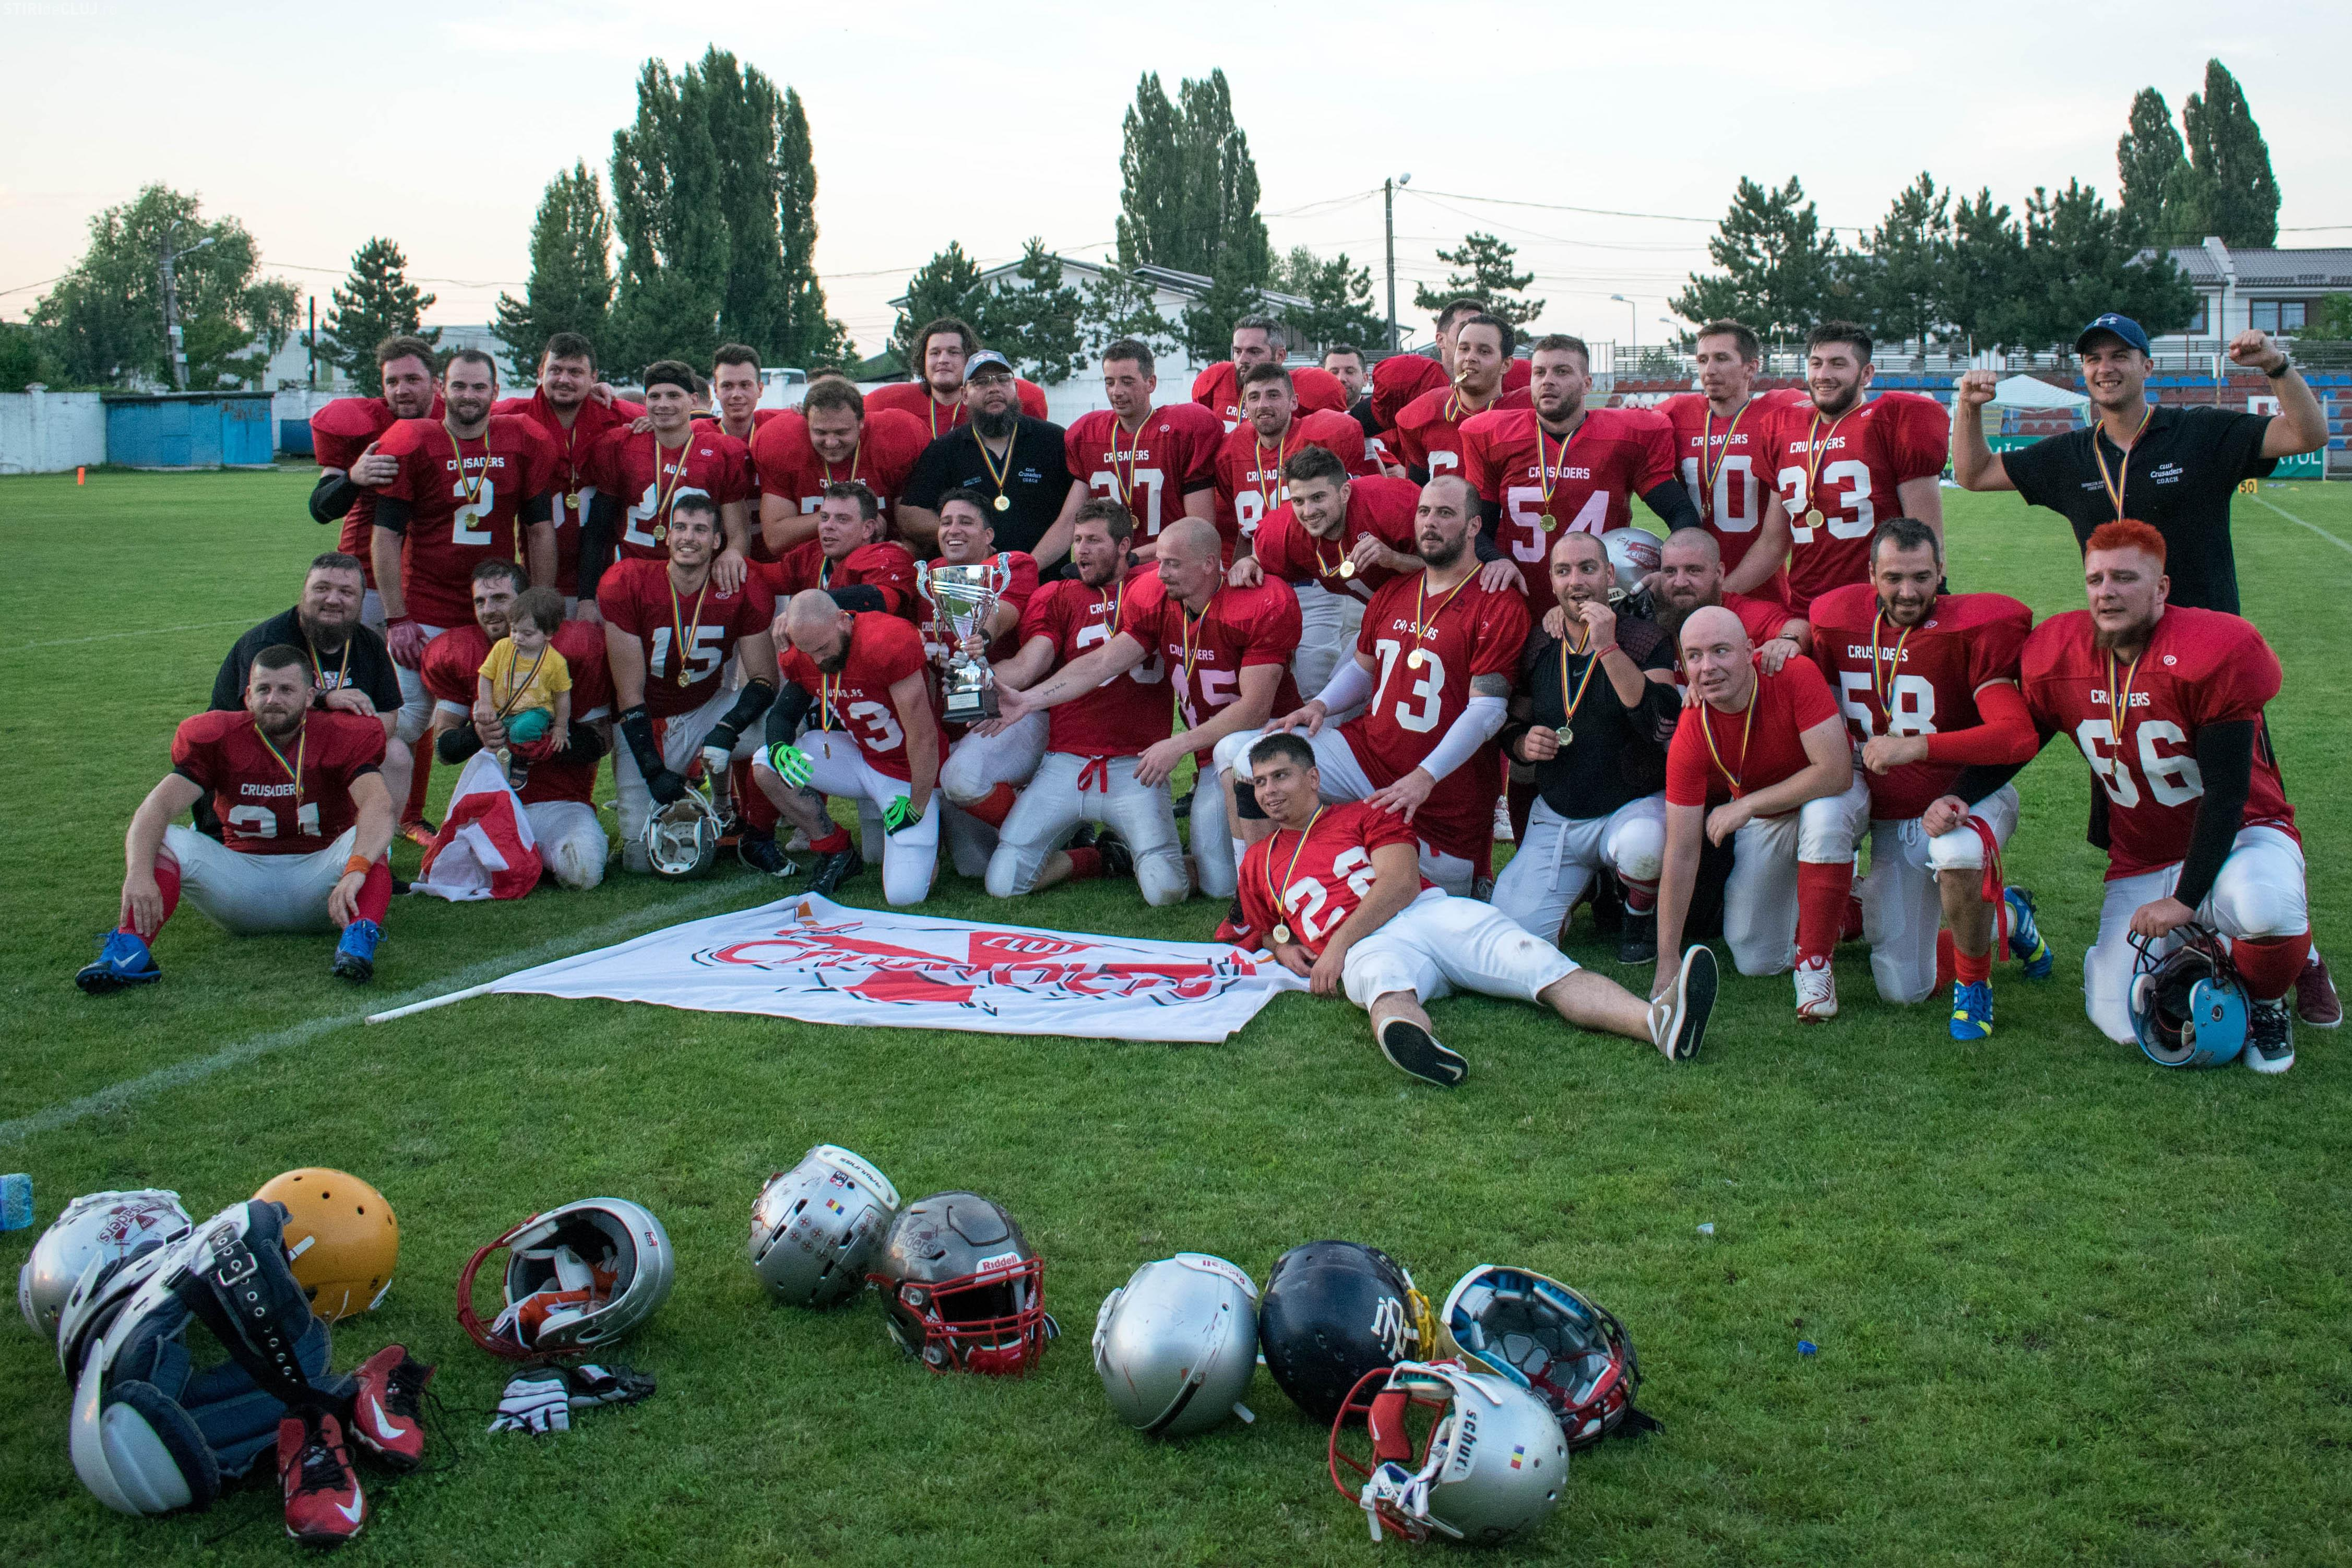 Cluj Crusaders e noua campioană a României la fotbal american FOTO